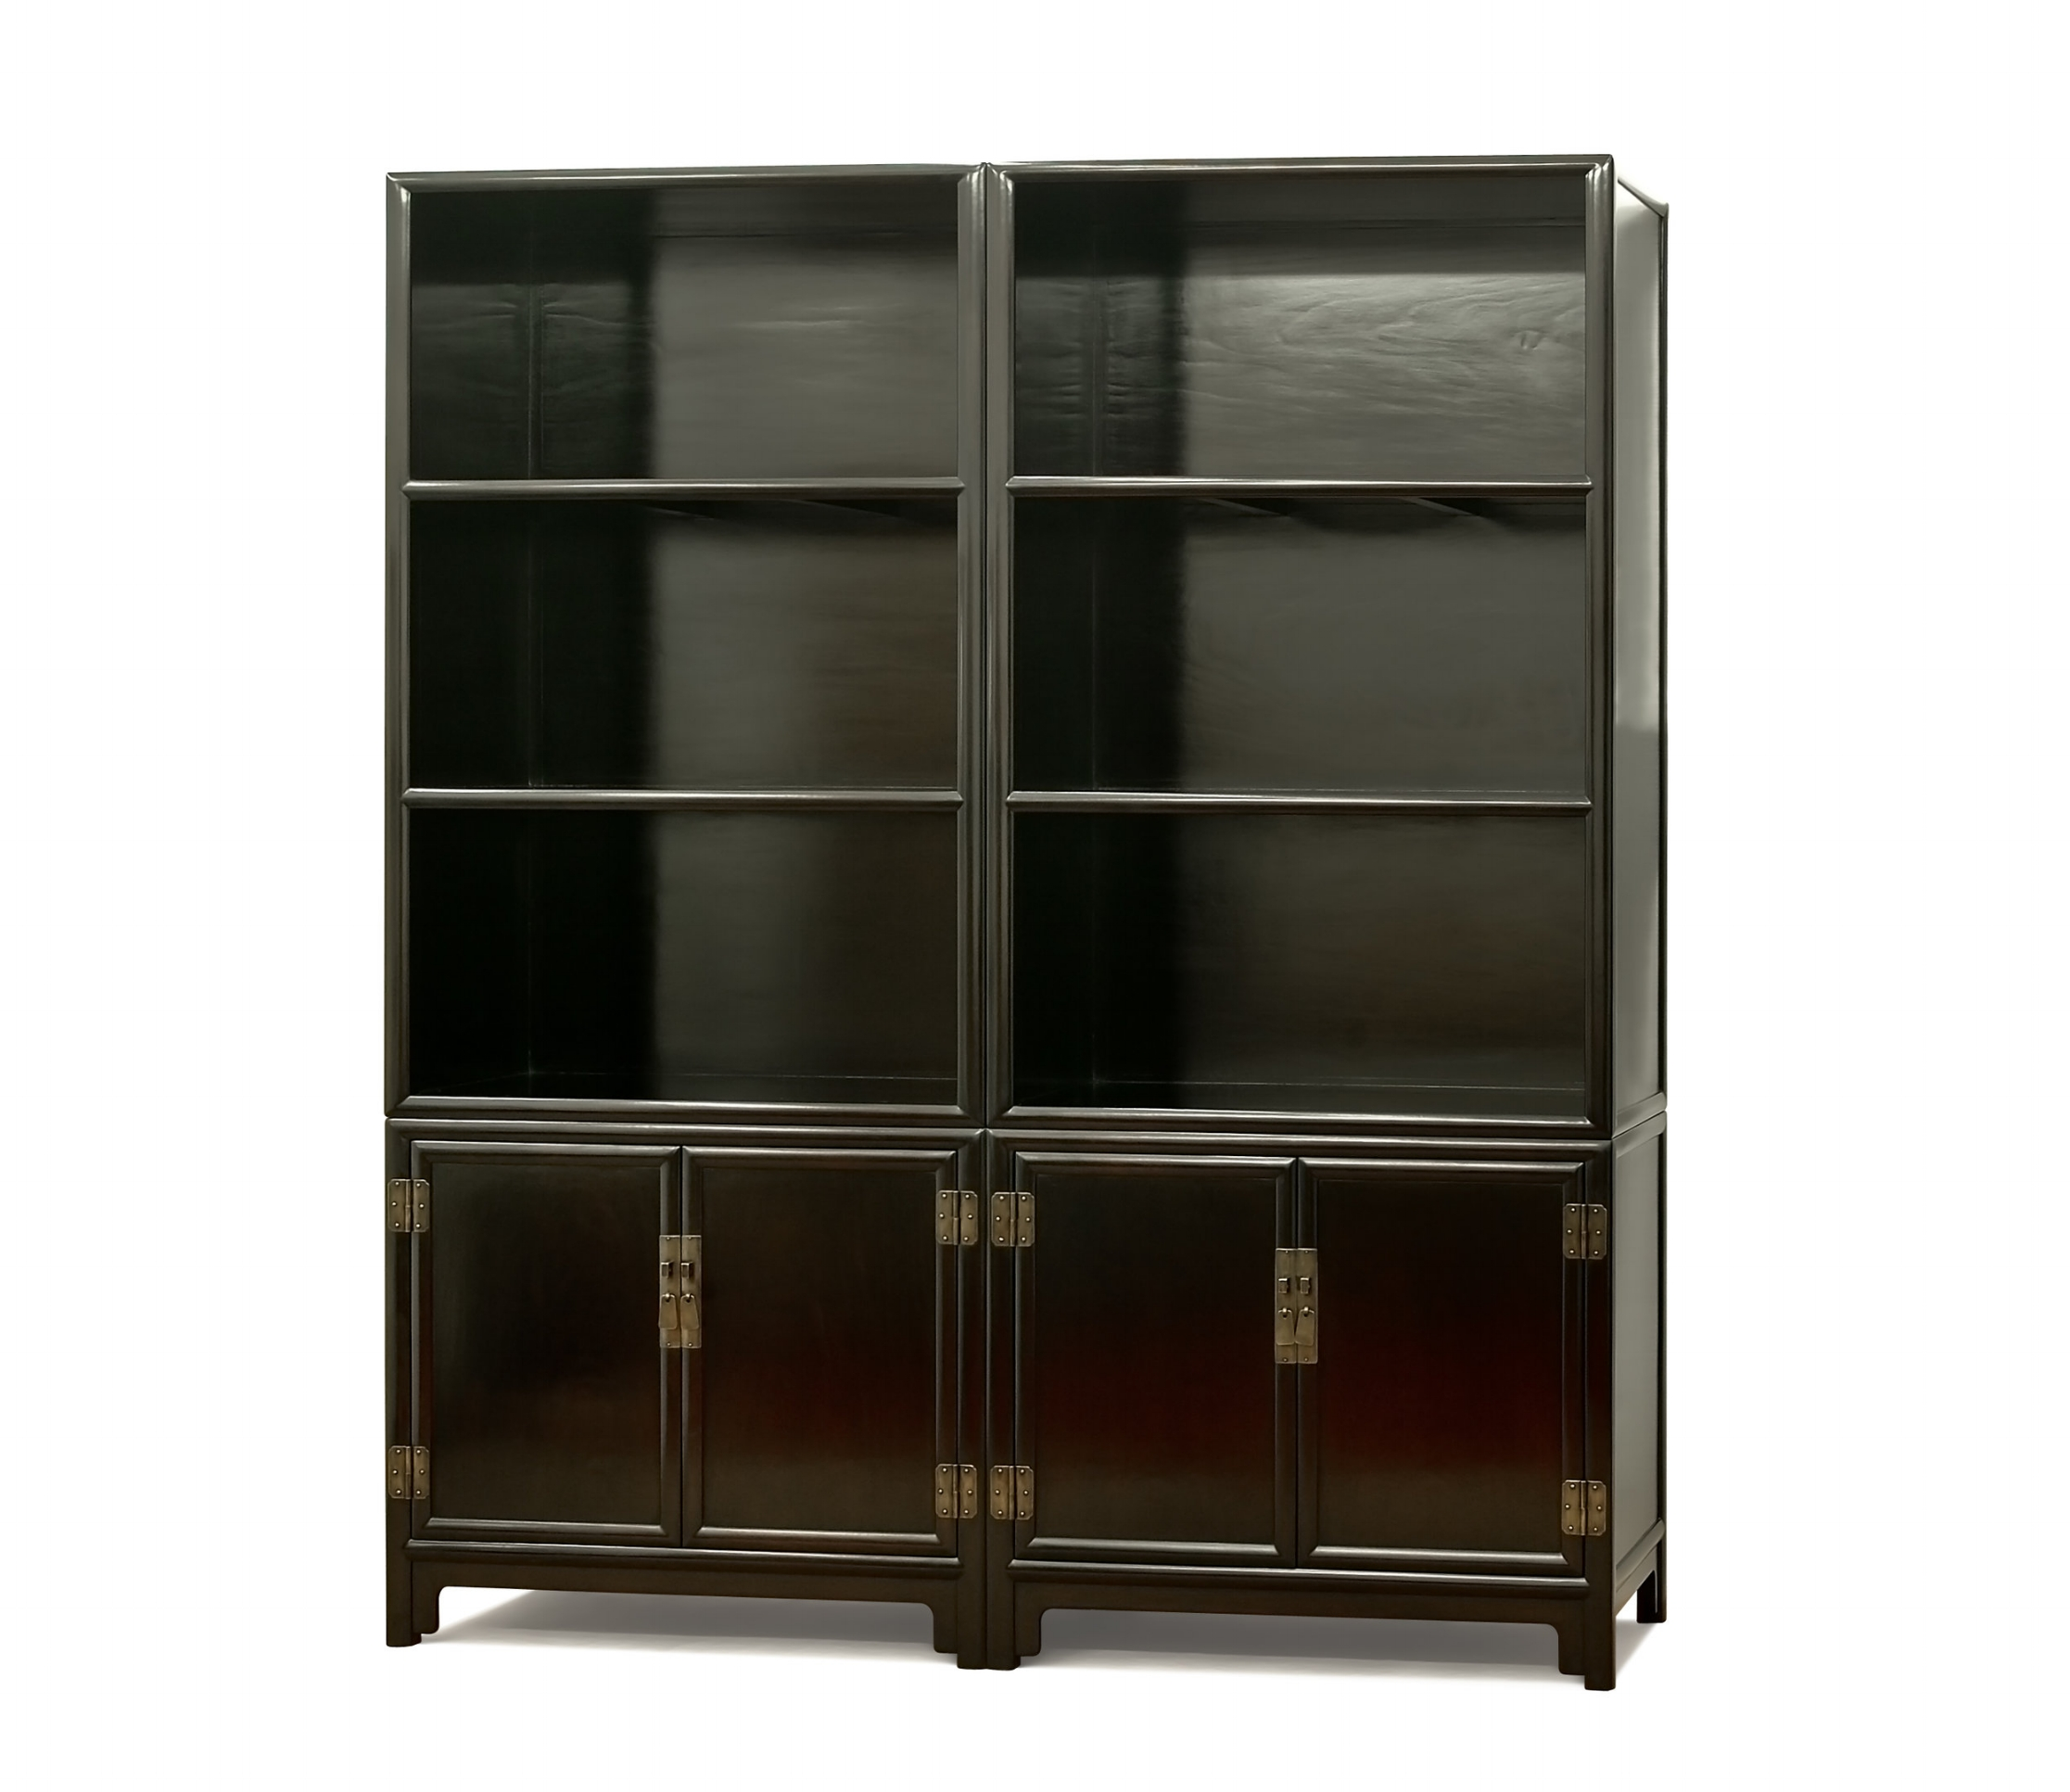 ....Ming Style Chinese furniture : Compound Shelf..明式中式家具: 组合书架....